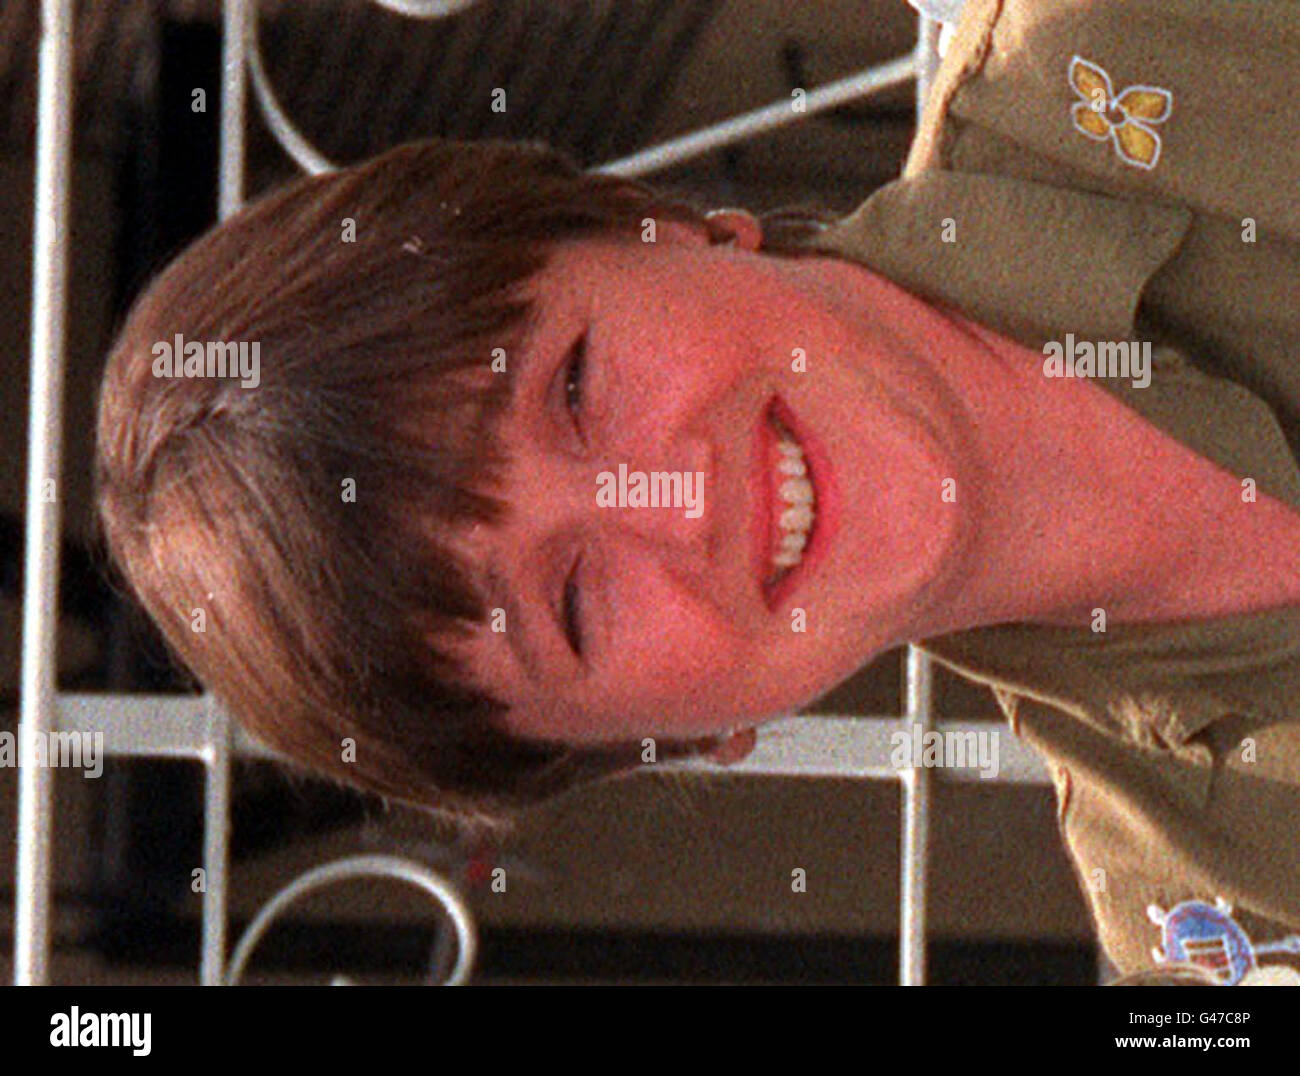 Sherrie Rose XXX pic Chasey Lain,Daisy Masterman